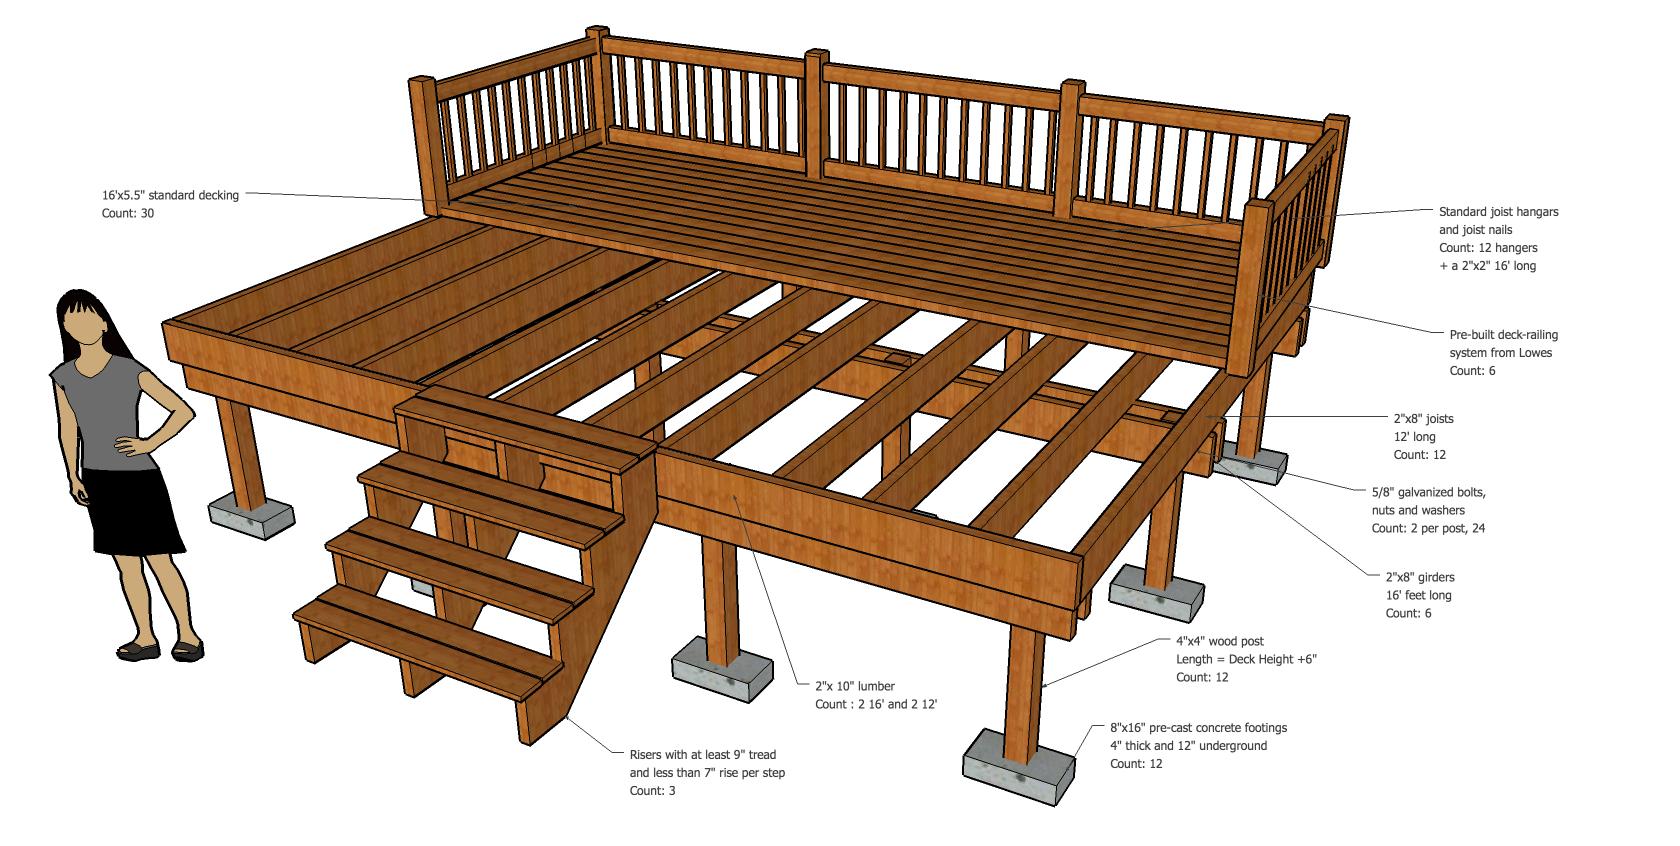 Deck Joist Design in 2020 Building a deck, Deck design